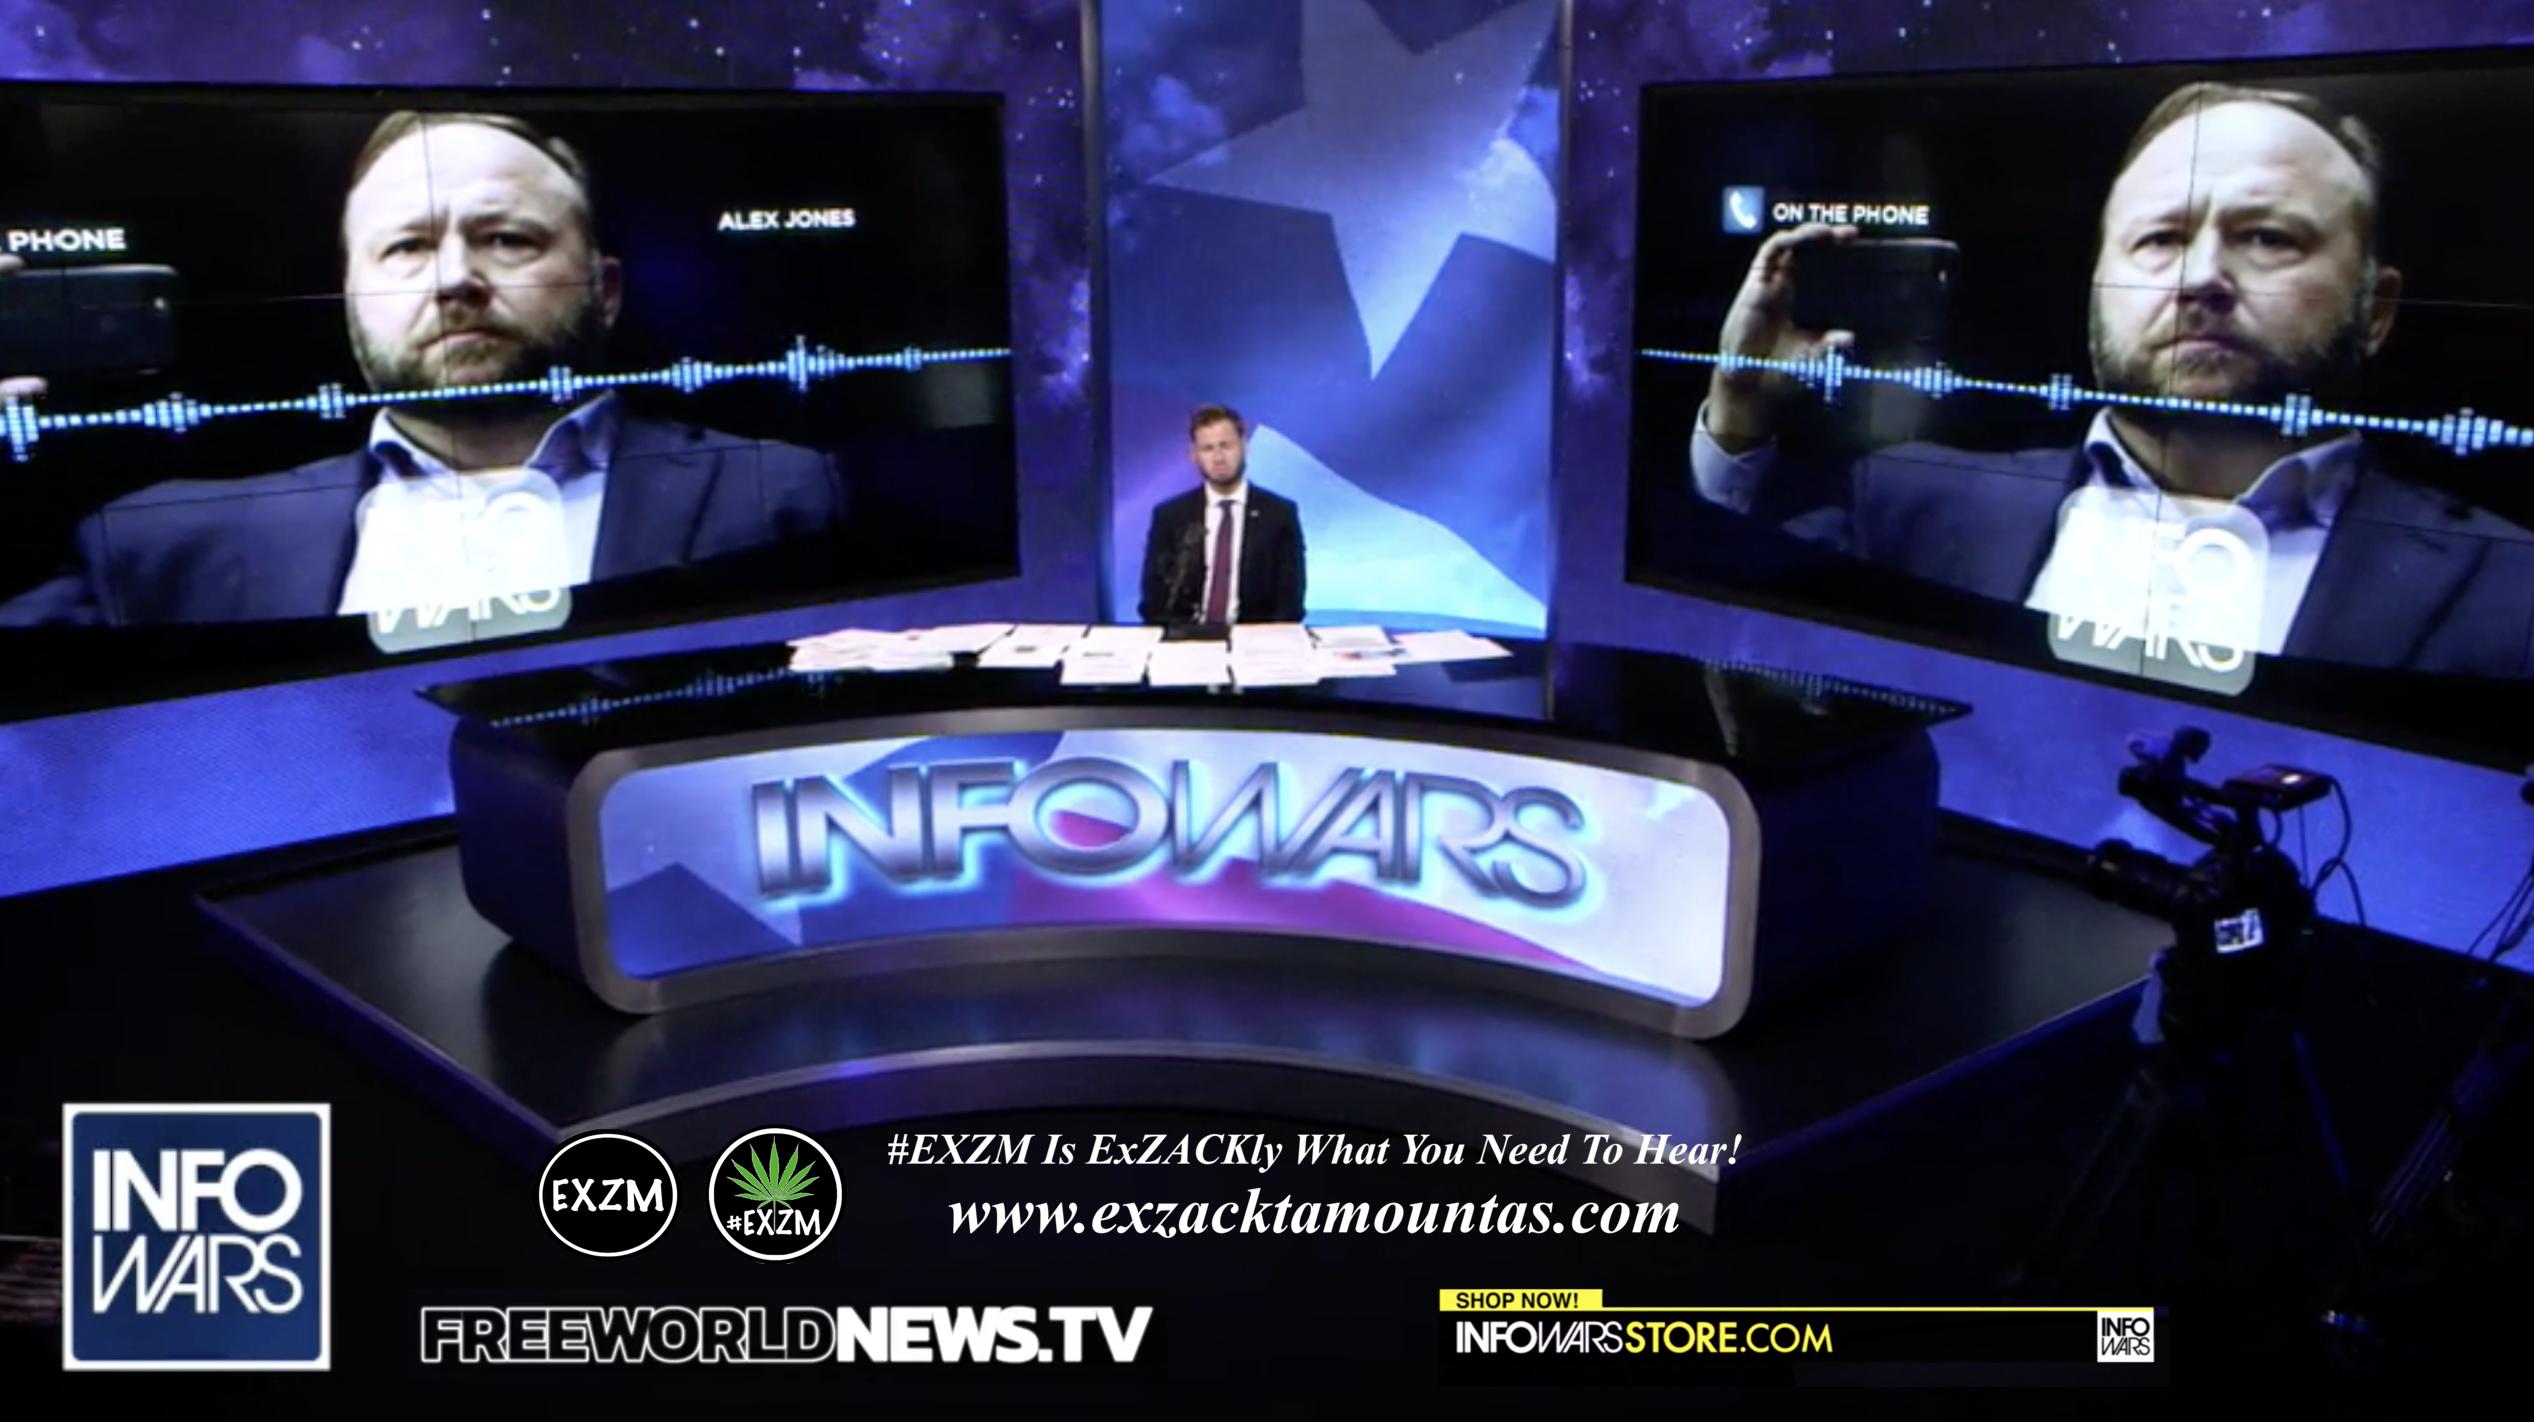 Alex Jones Owen Shroyer Live In Infowars Studio Free World News TV EXZM Zack Mount July 29th 2021